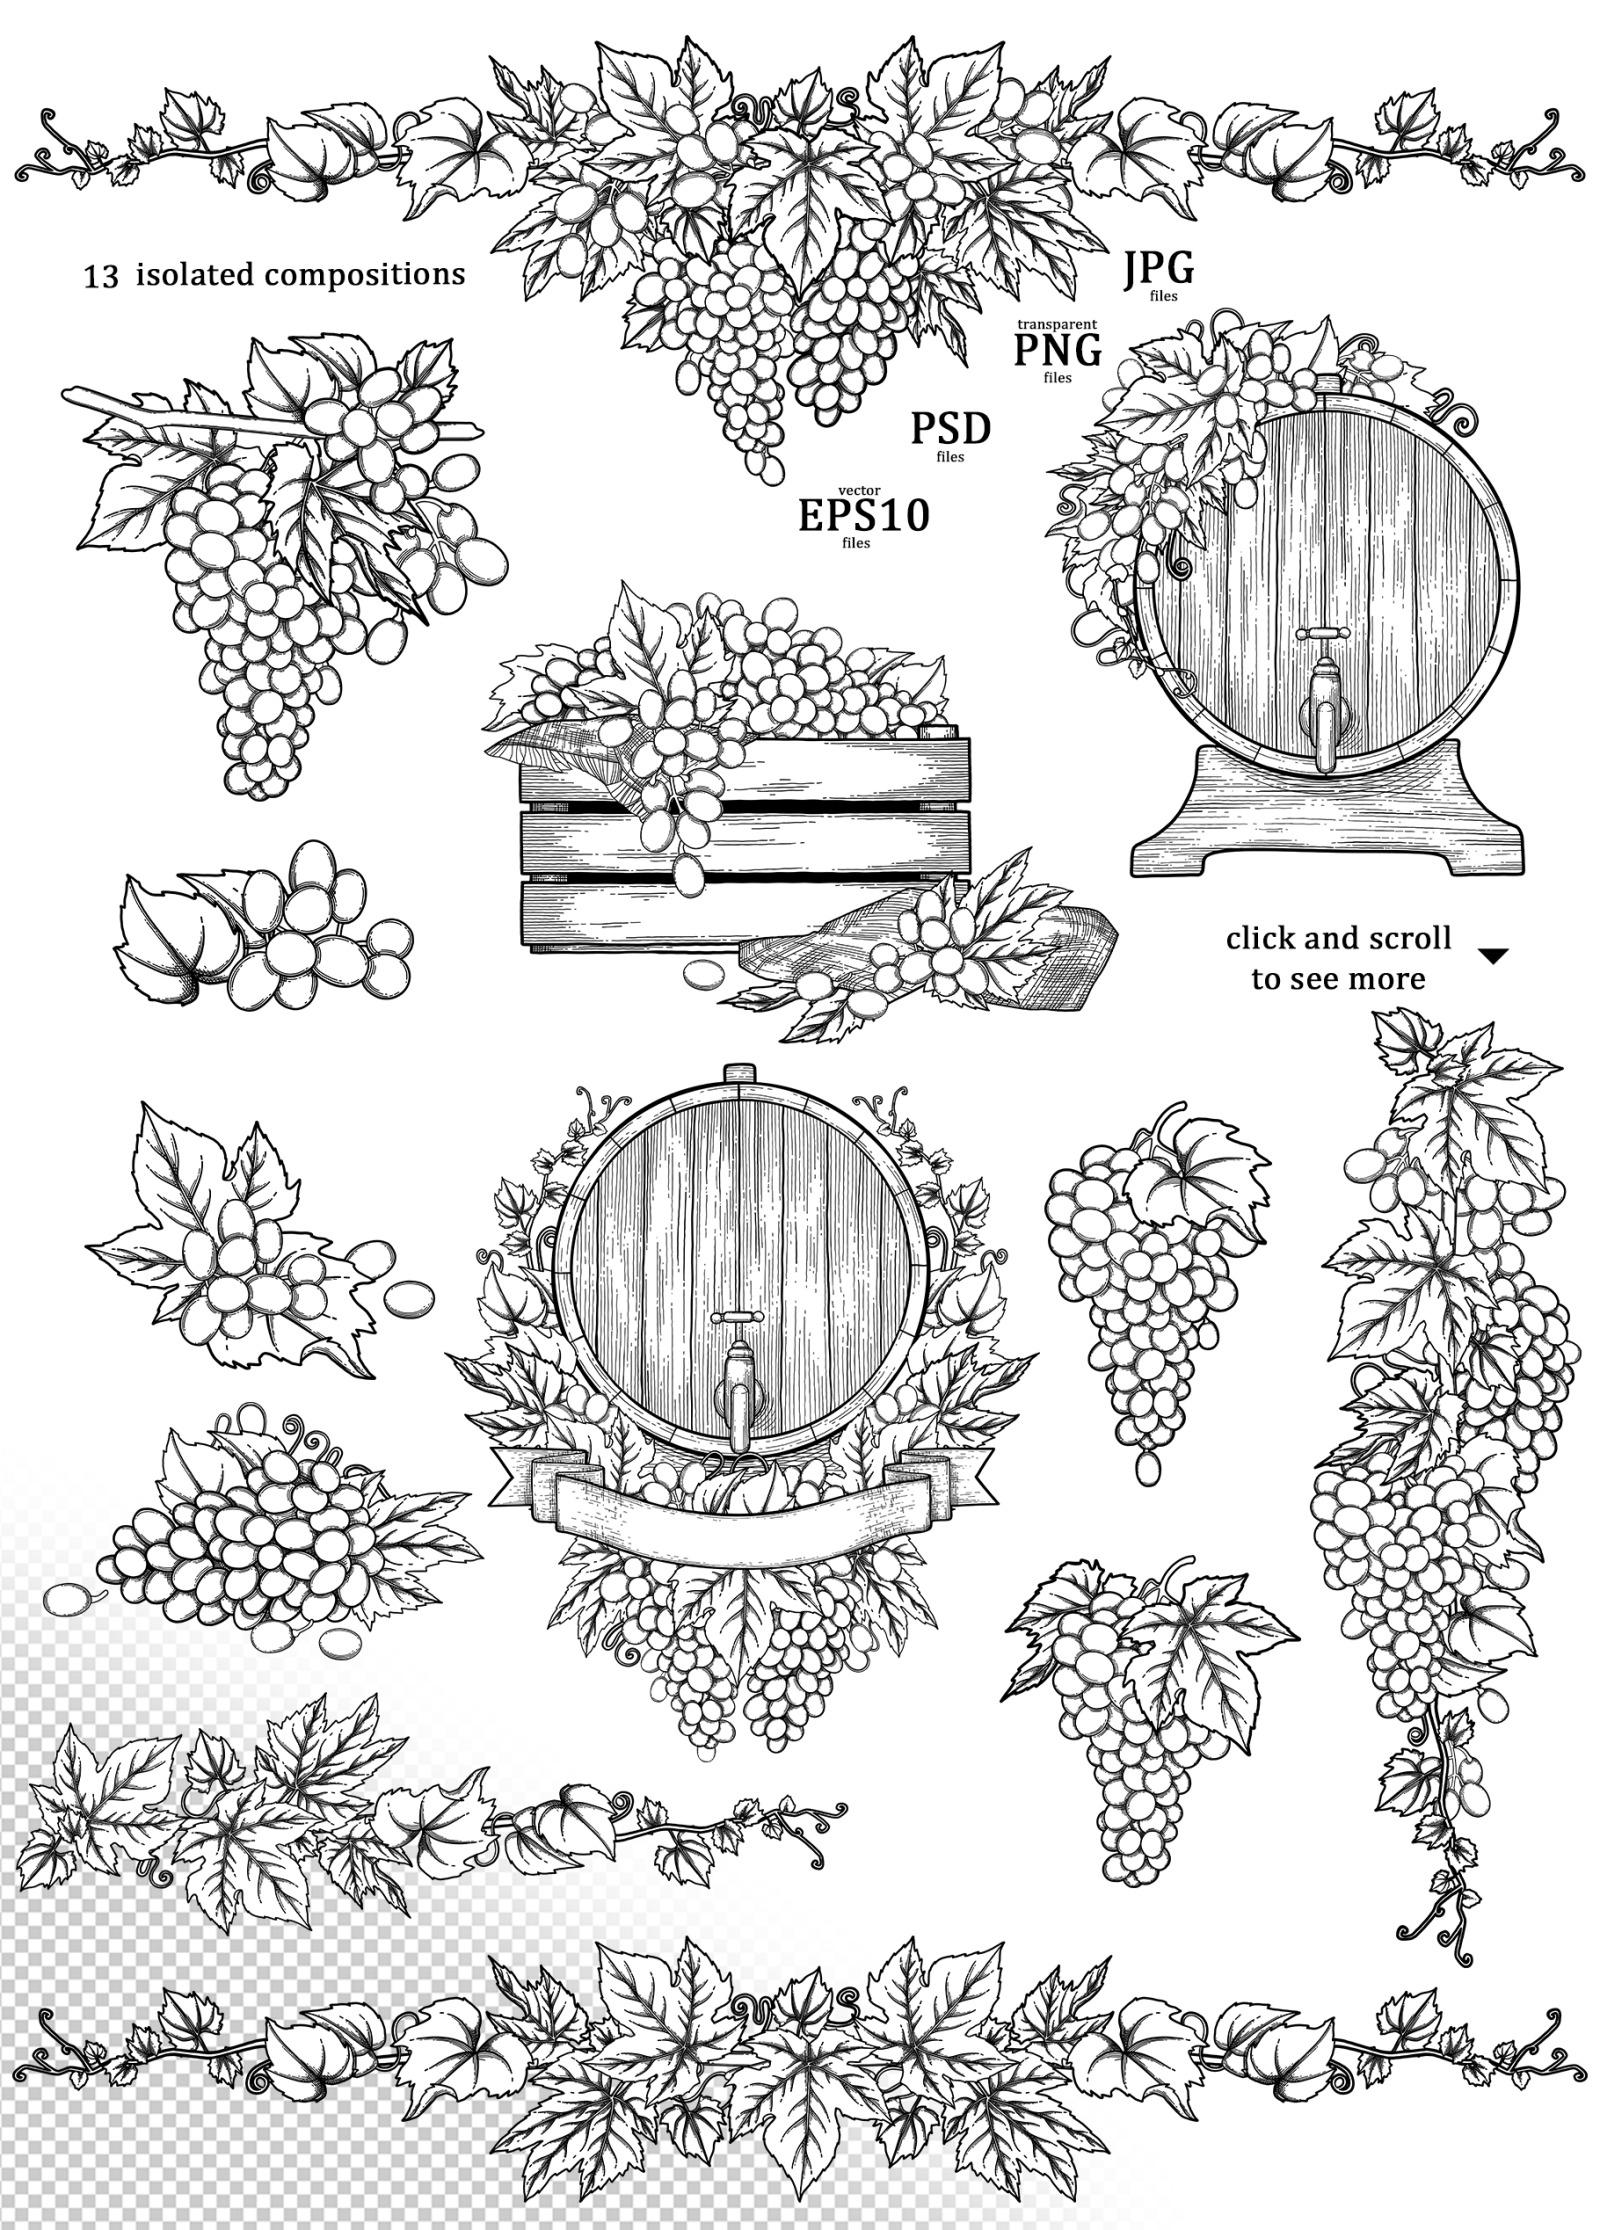 Grapes - vector graphics